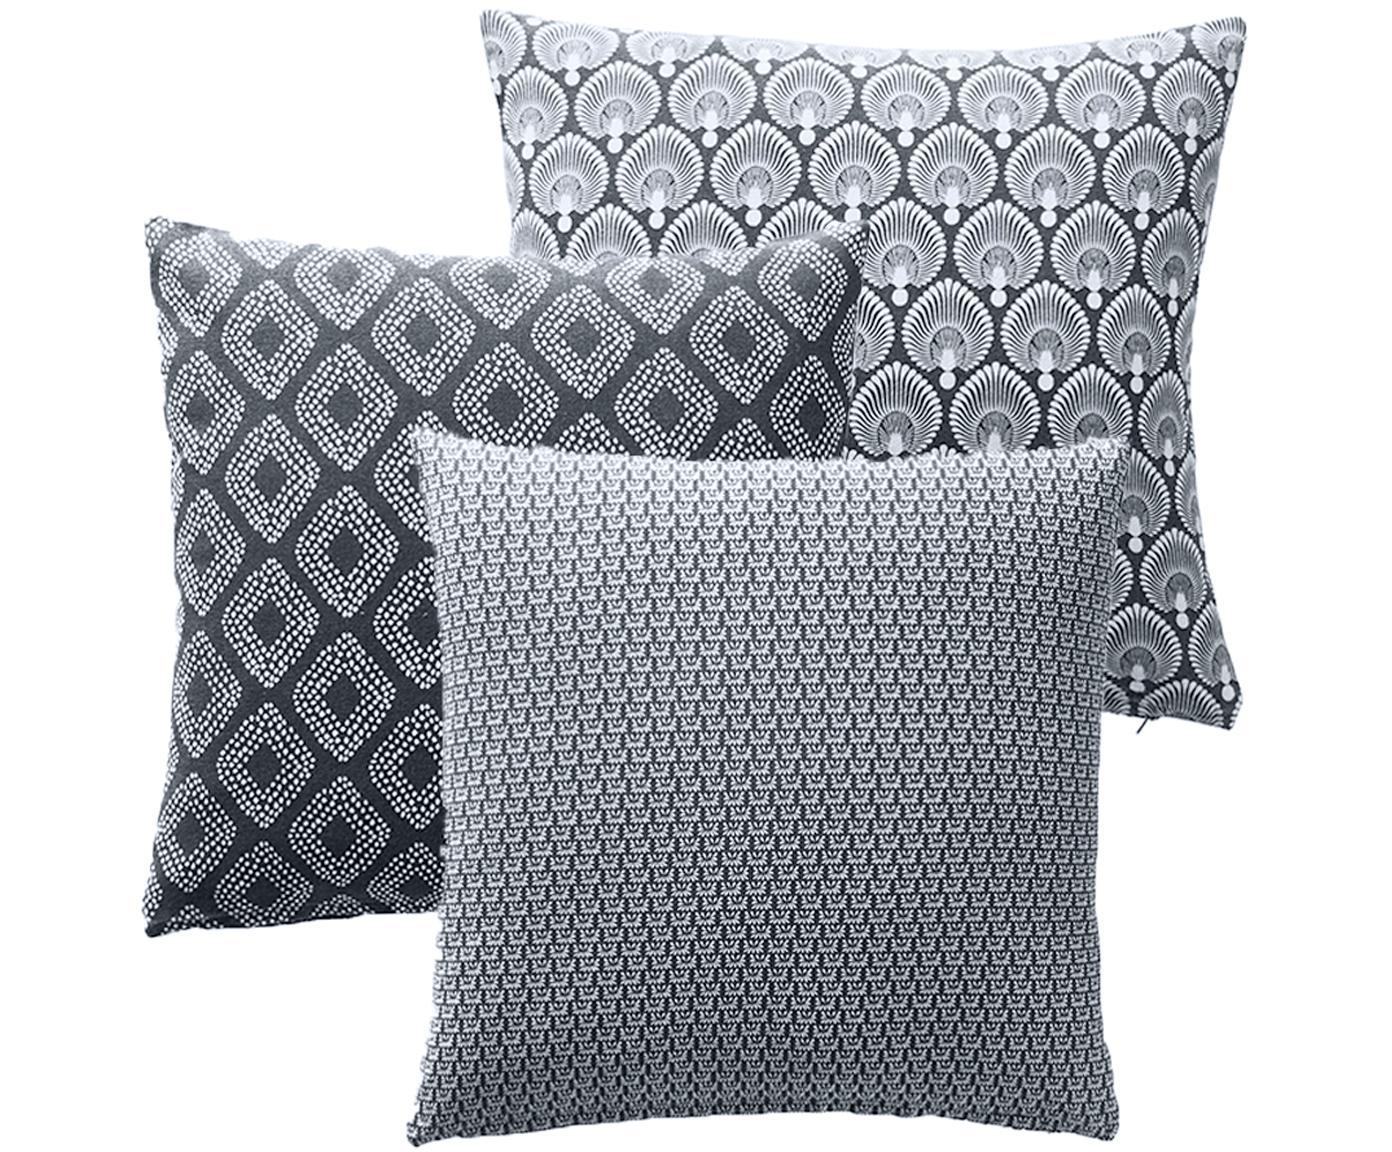 Gemustertes Kissenhüllen 3er Set Cousin in Grau, 100% Baumwolle, Grau, Weiß, 45 x 45 cm